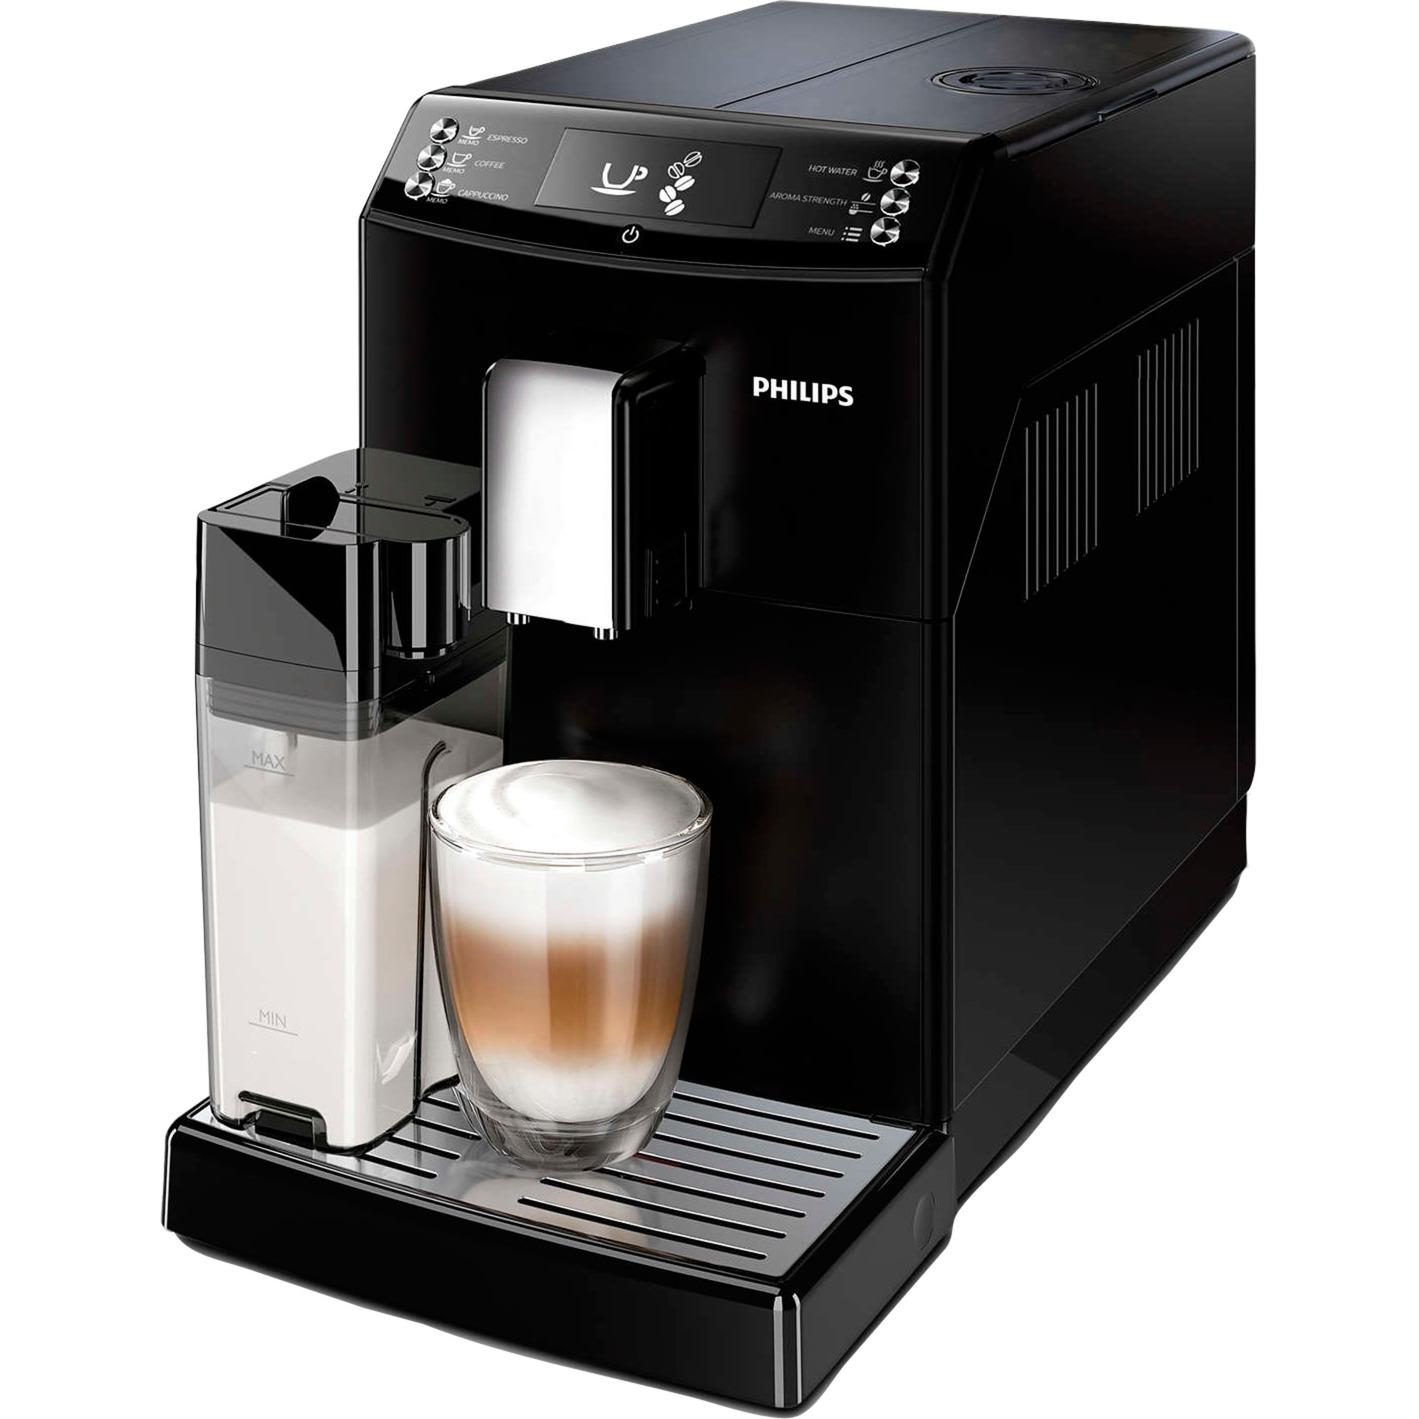 3100 series EP3550/00 cafetera eléctrica Independiente Máquina espresso Negro 1,8 L Totalmente automática, Superautomática